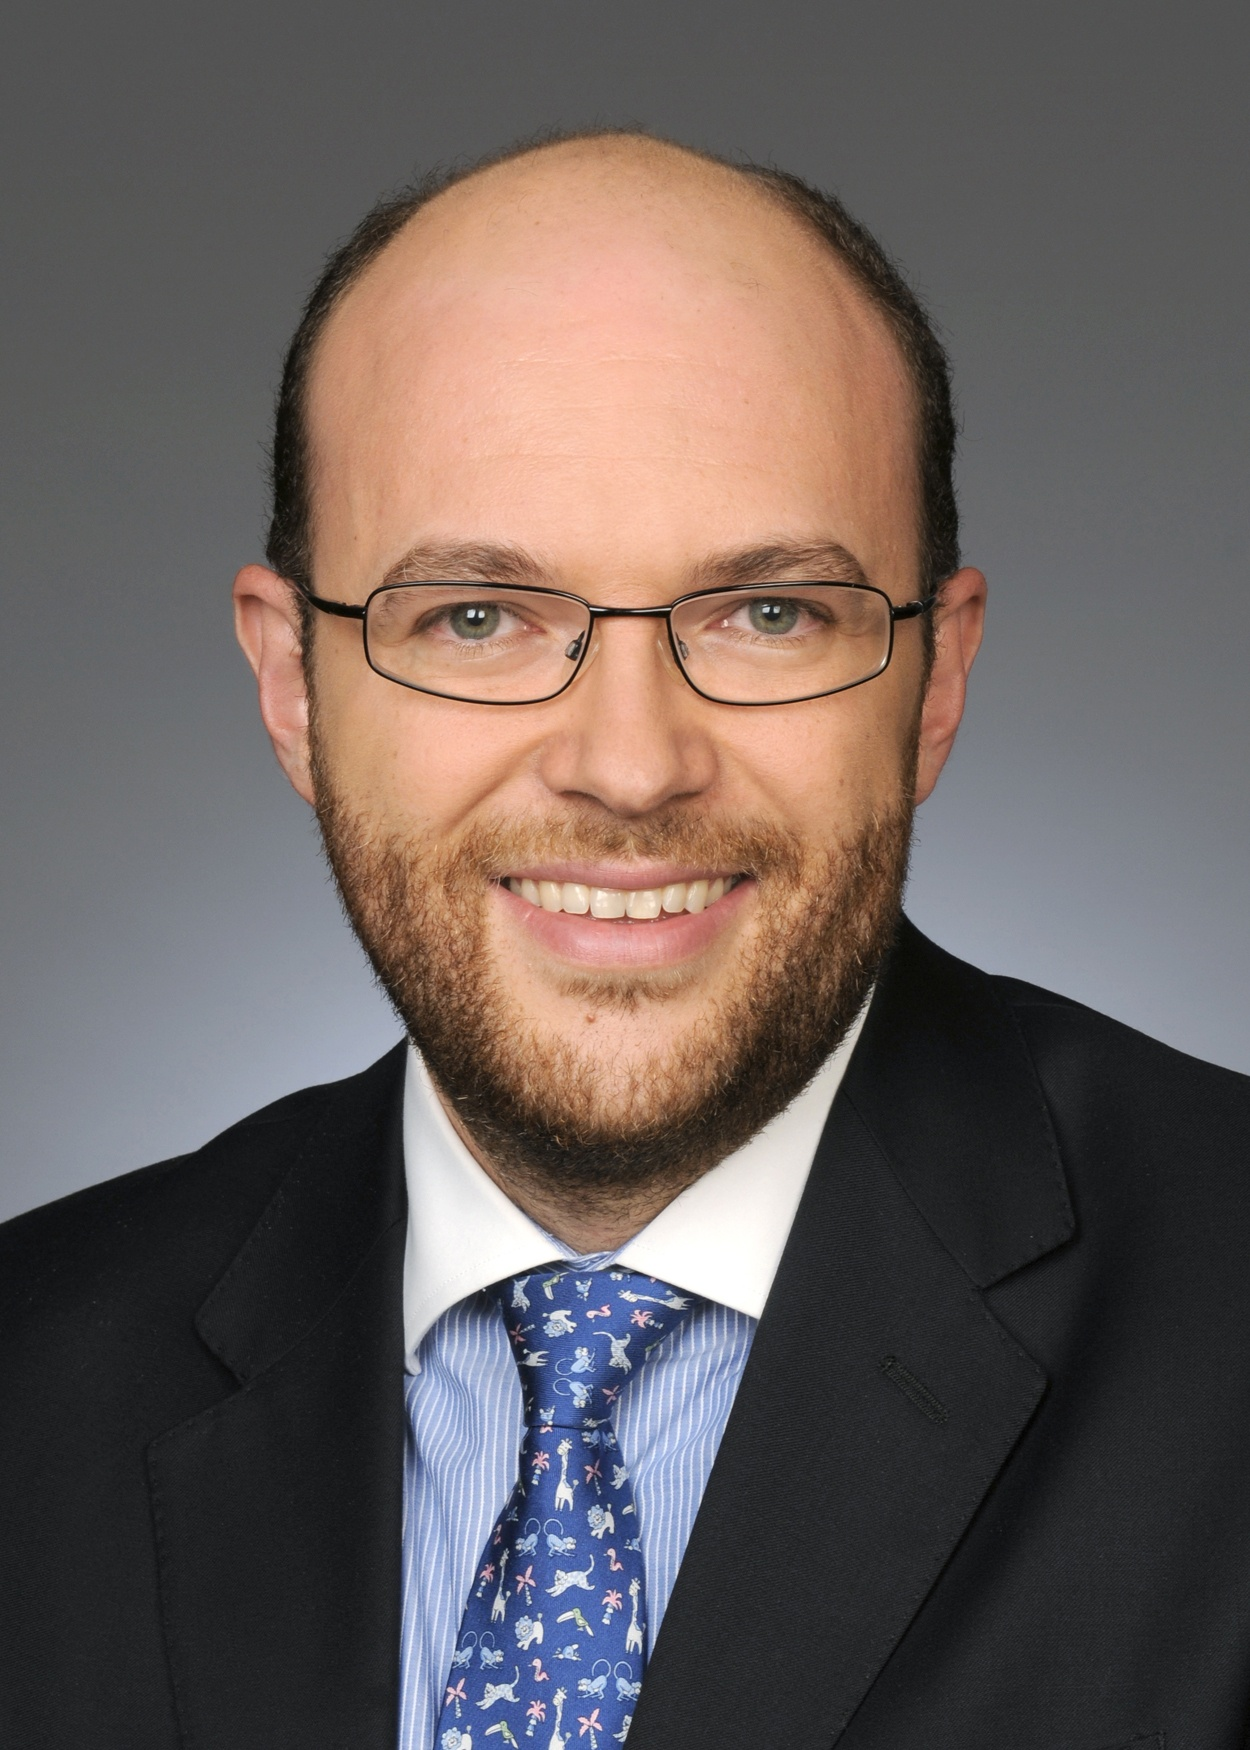 Raul Padron